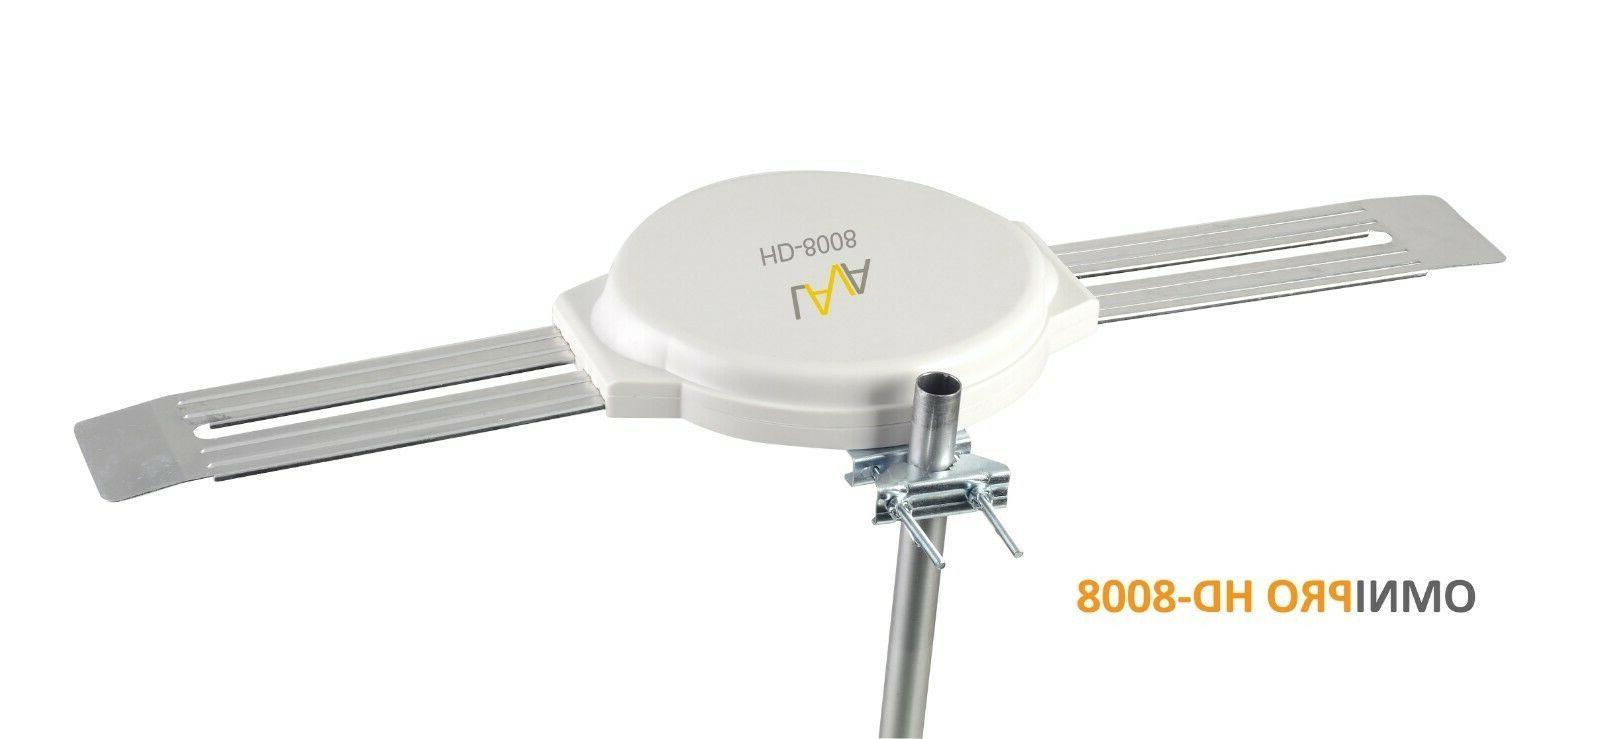 hd8008 omnidirectional outdoor tv antenna hd tv